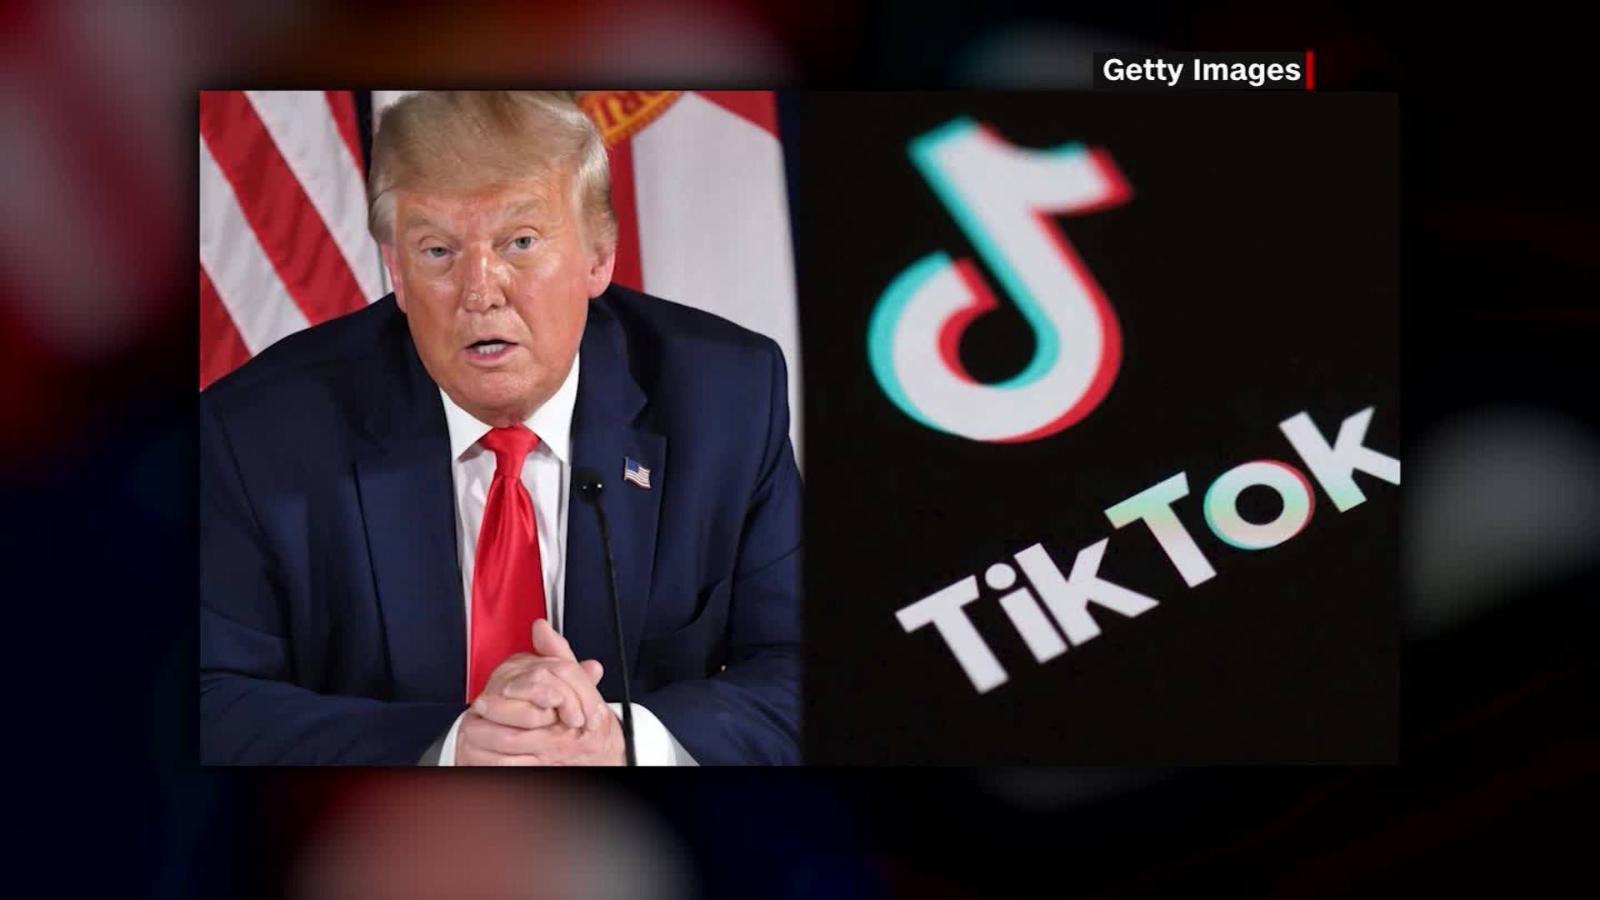 TikTok, Trump and a dangerous precedent for democracy - CNN